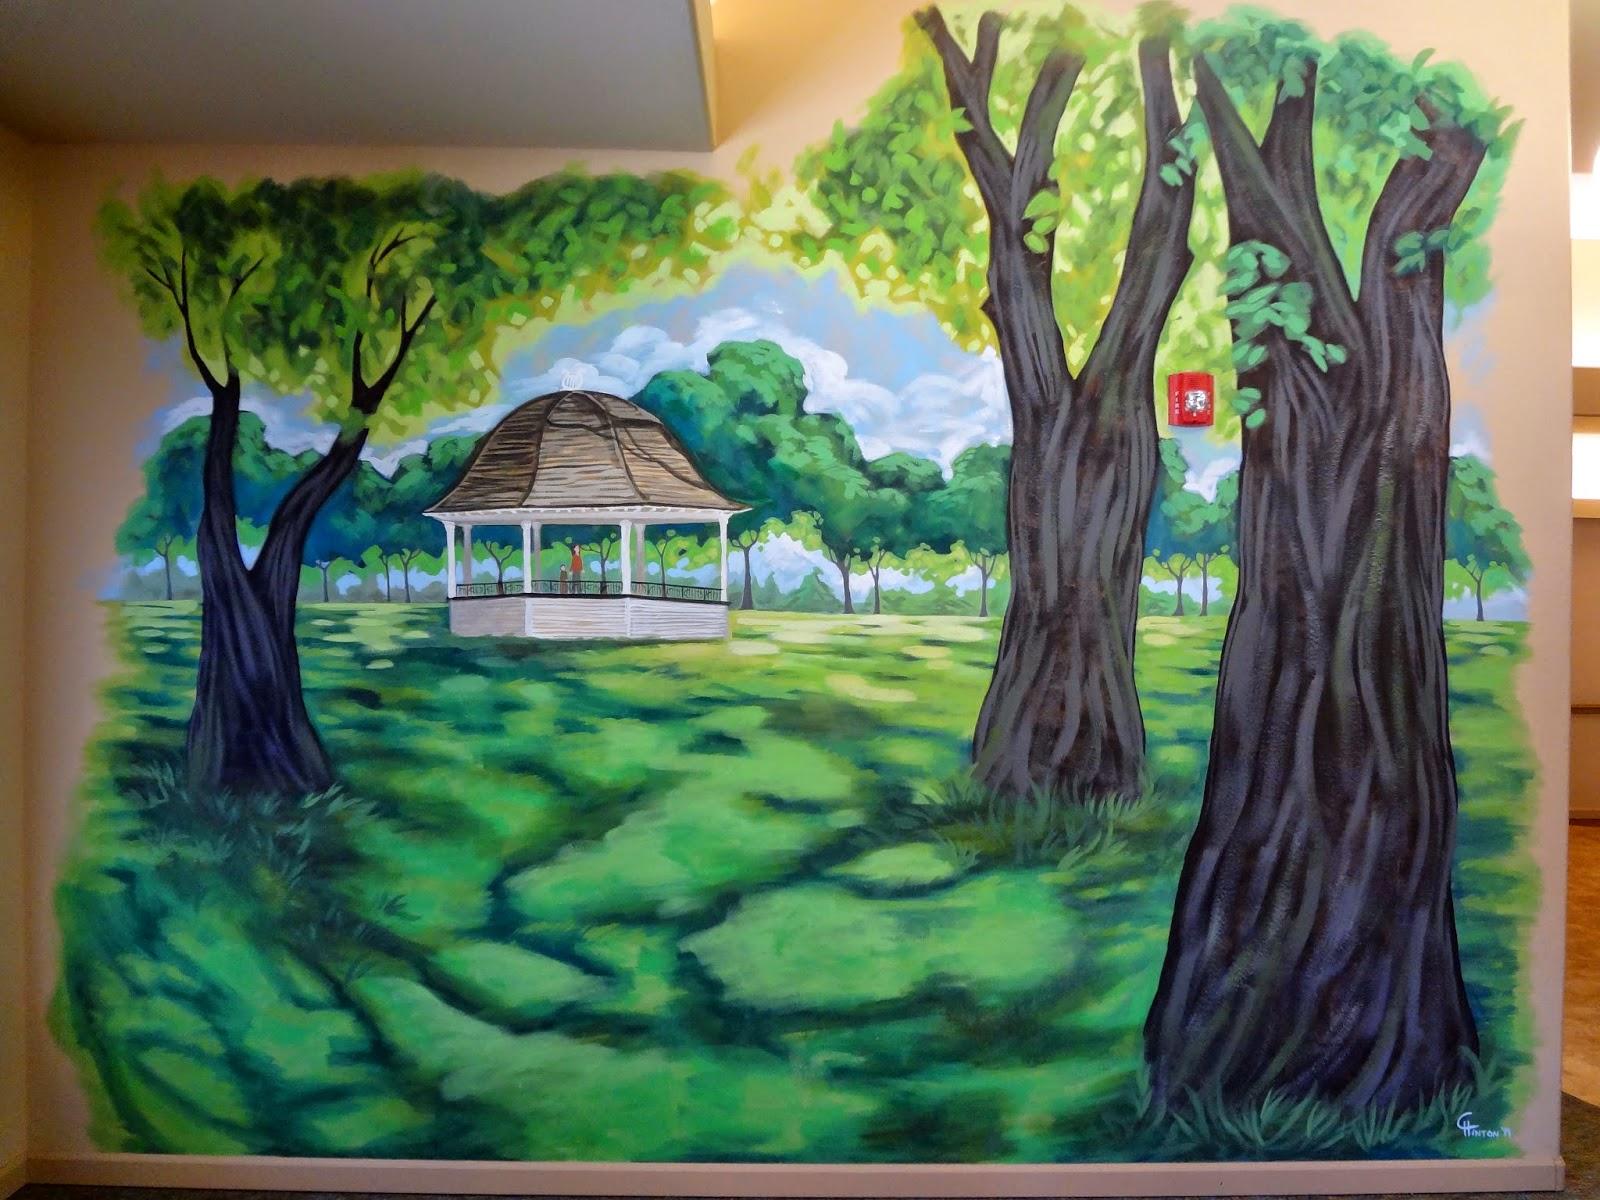 portland oregon muralist, memory care mural, pioneer park walla walla, park mural